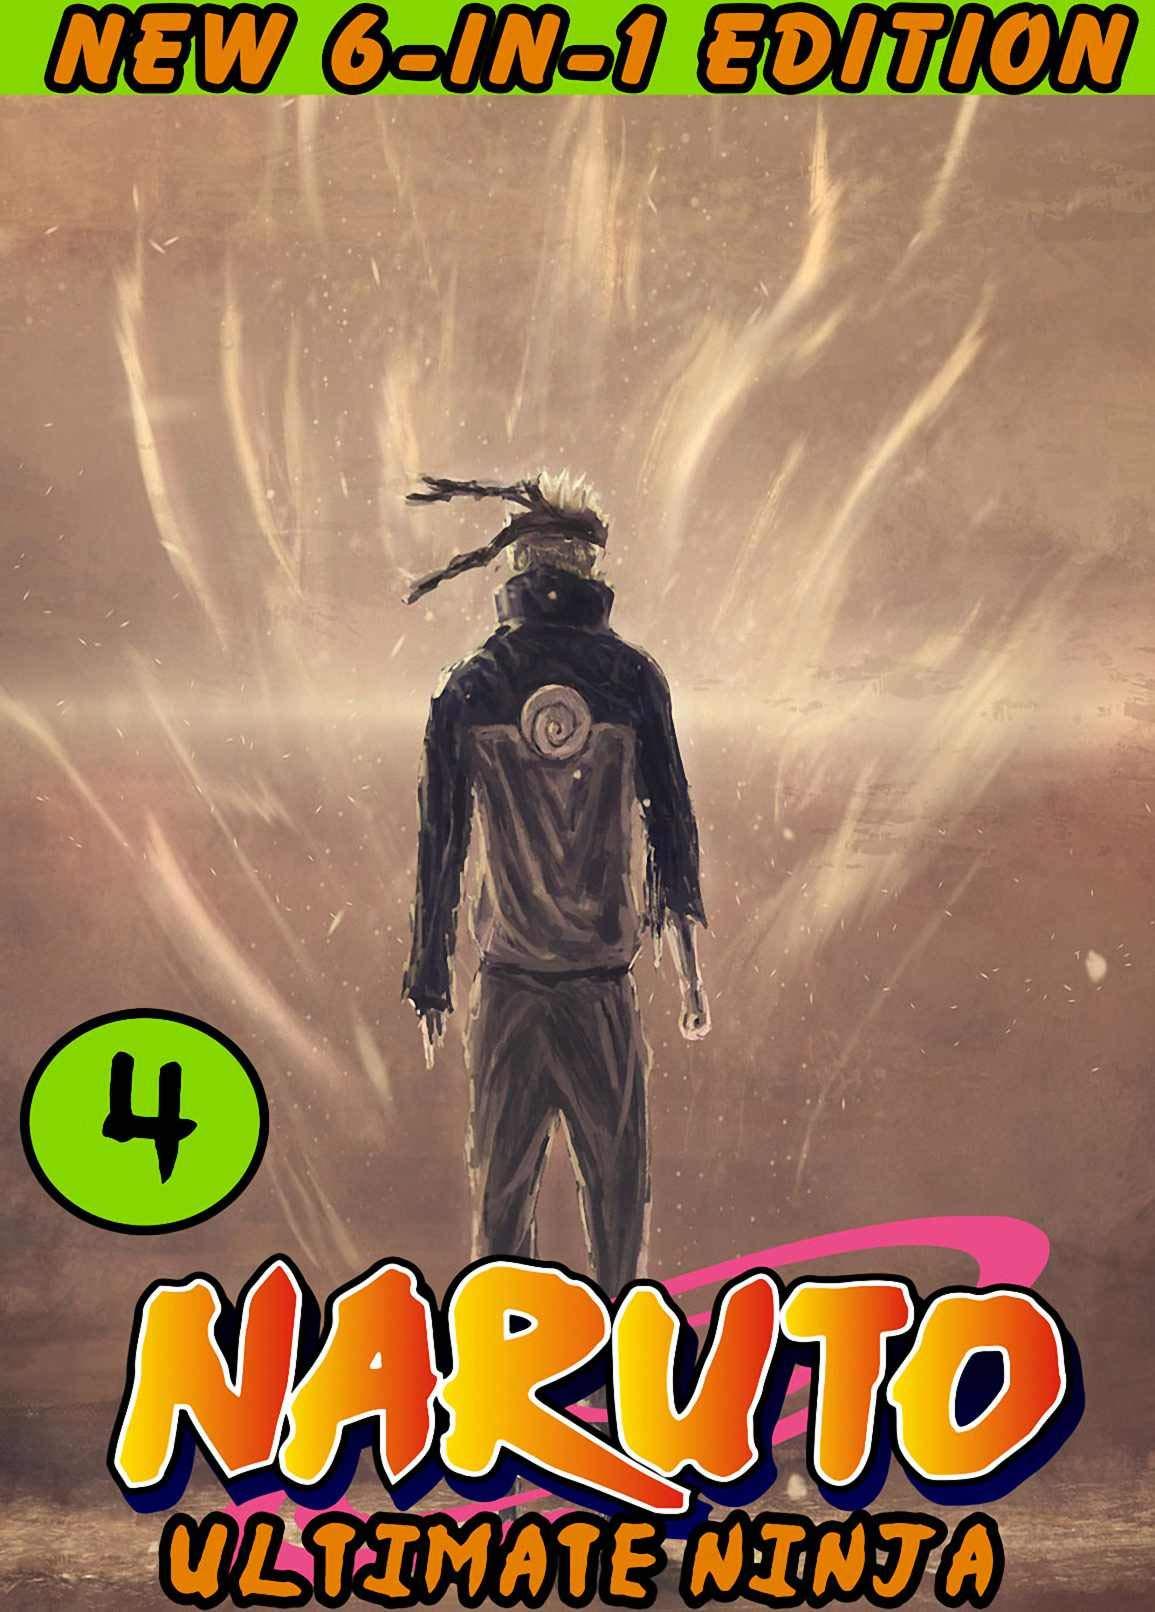 Ultimate NinJa: New 6-in-1 Edition Set 4 - Naruto Ninja Shonen Action Manga Graphic Novel